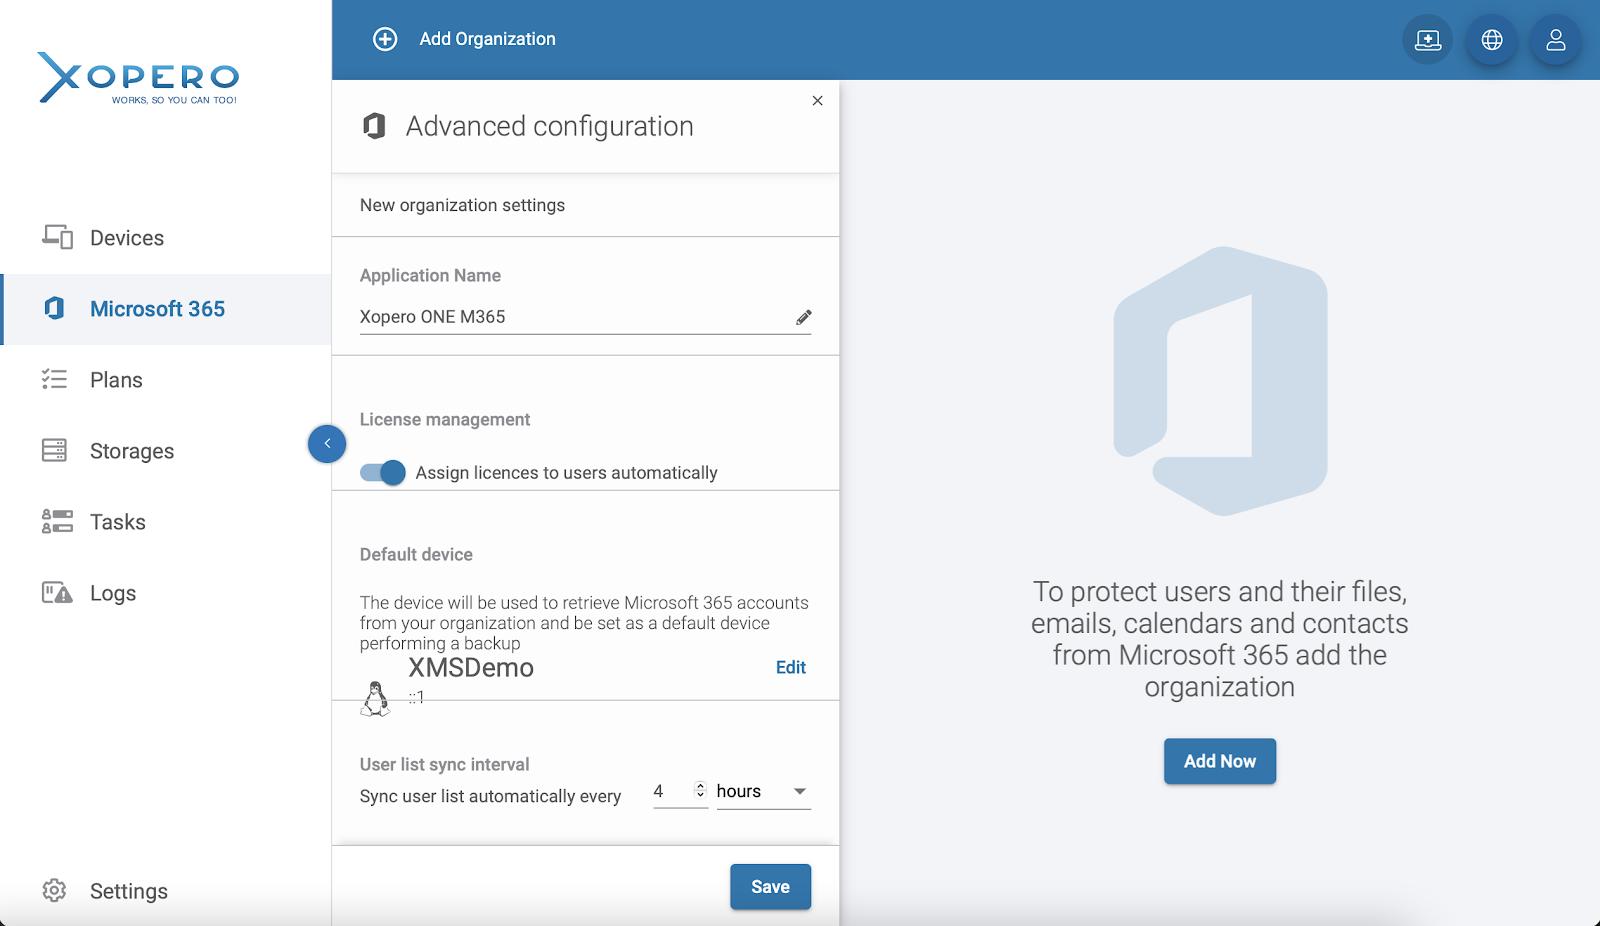 Microsoft 365 organization - advanced configuration settings